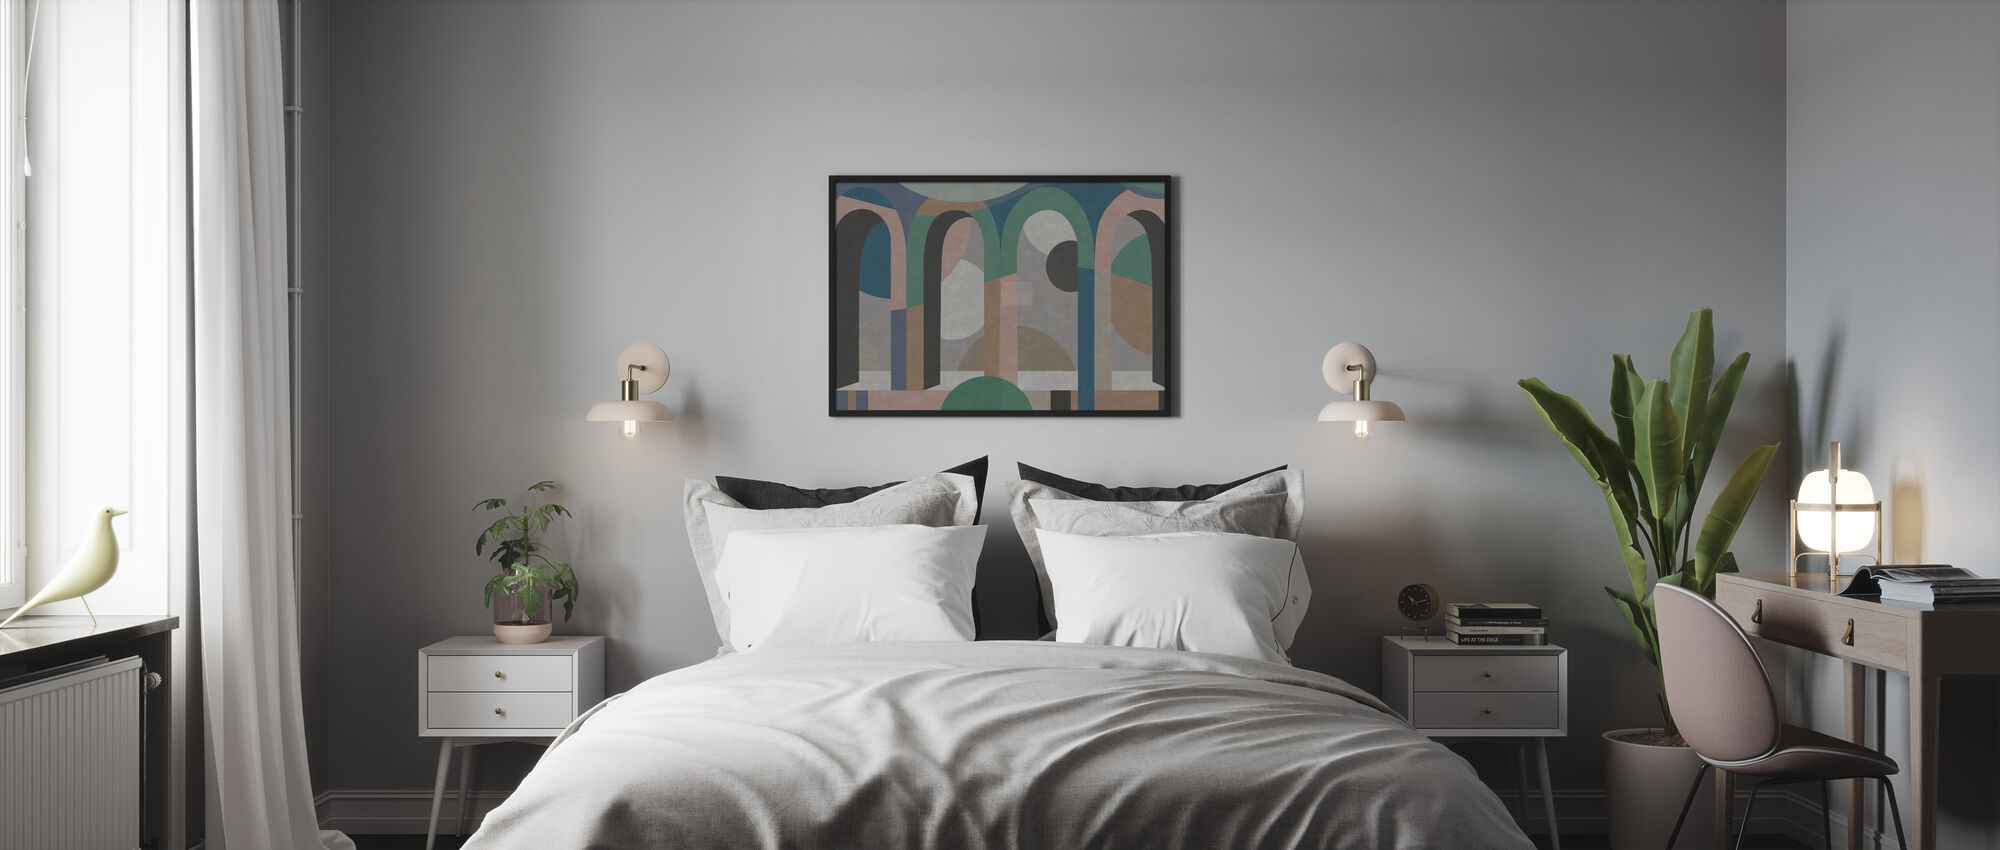 Archform - Poster - Bedroom